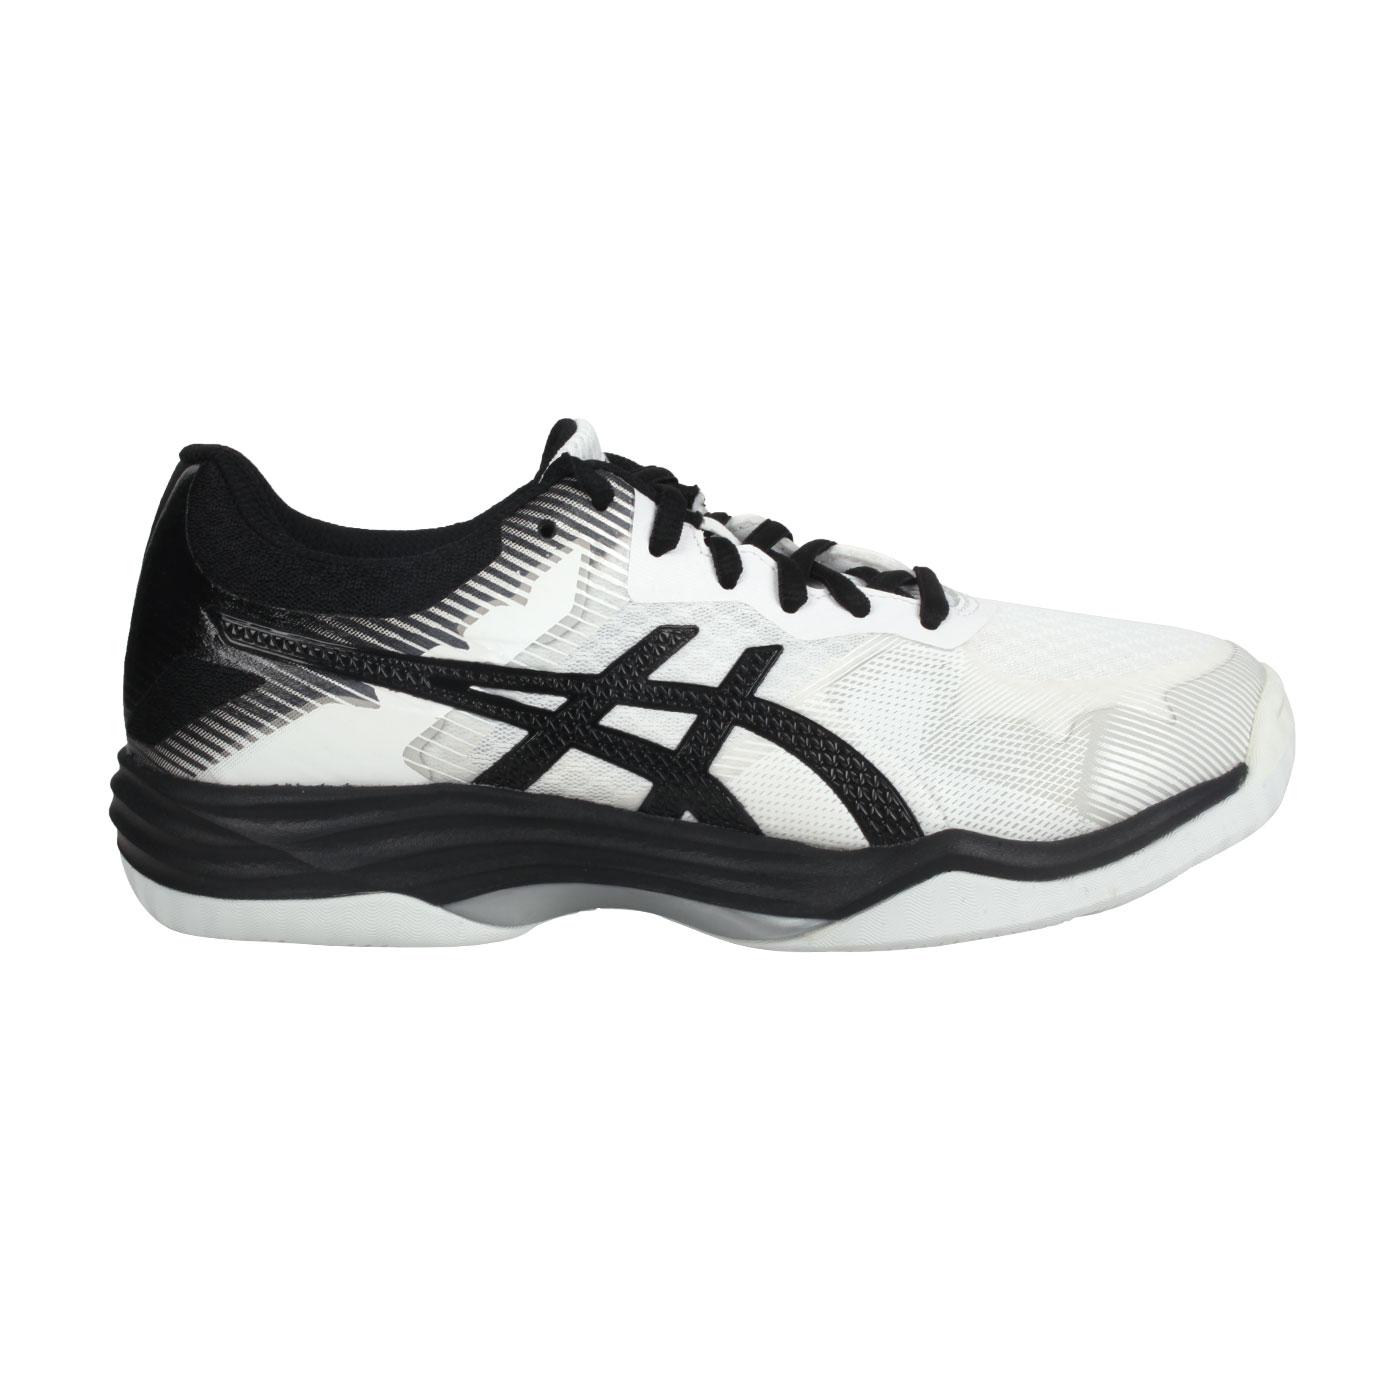 ASICS 排羽球鞋-2E  @GEL-TACTIC@1073A032-100 - 白黑